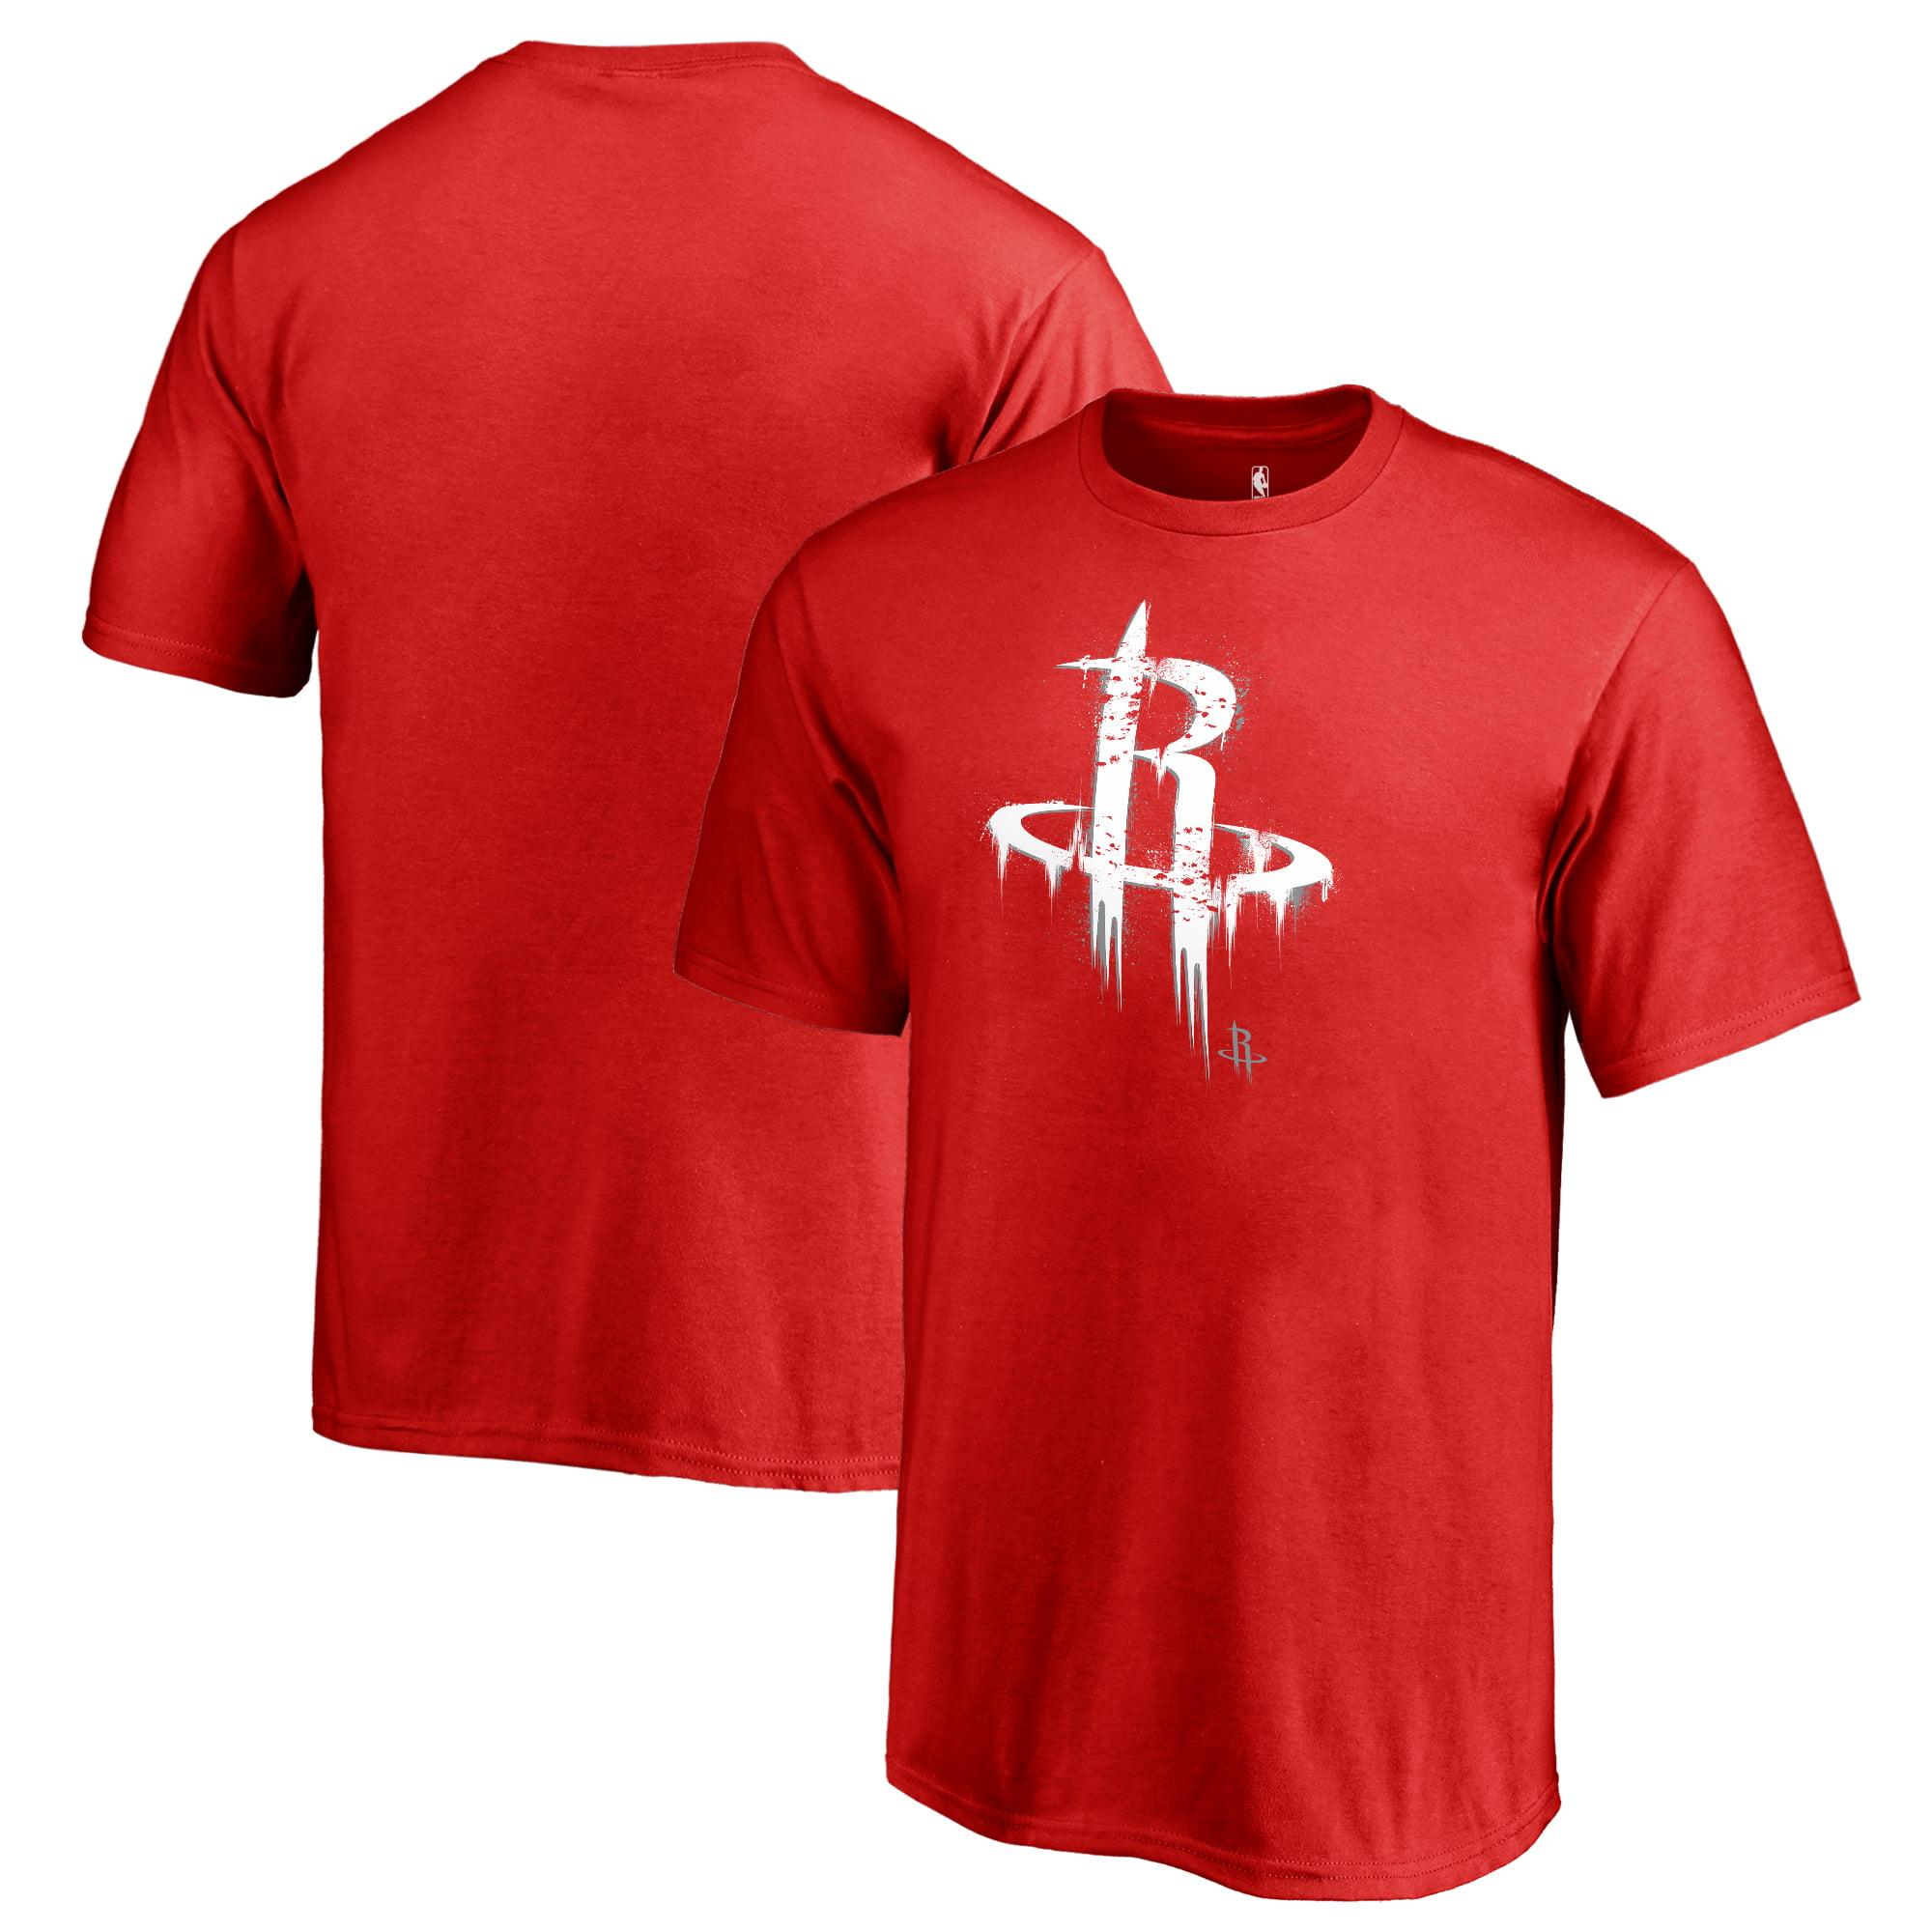 Houston Rockets Fanatics Branded Youth Splatter Logo T-Shirt - Red